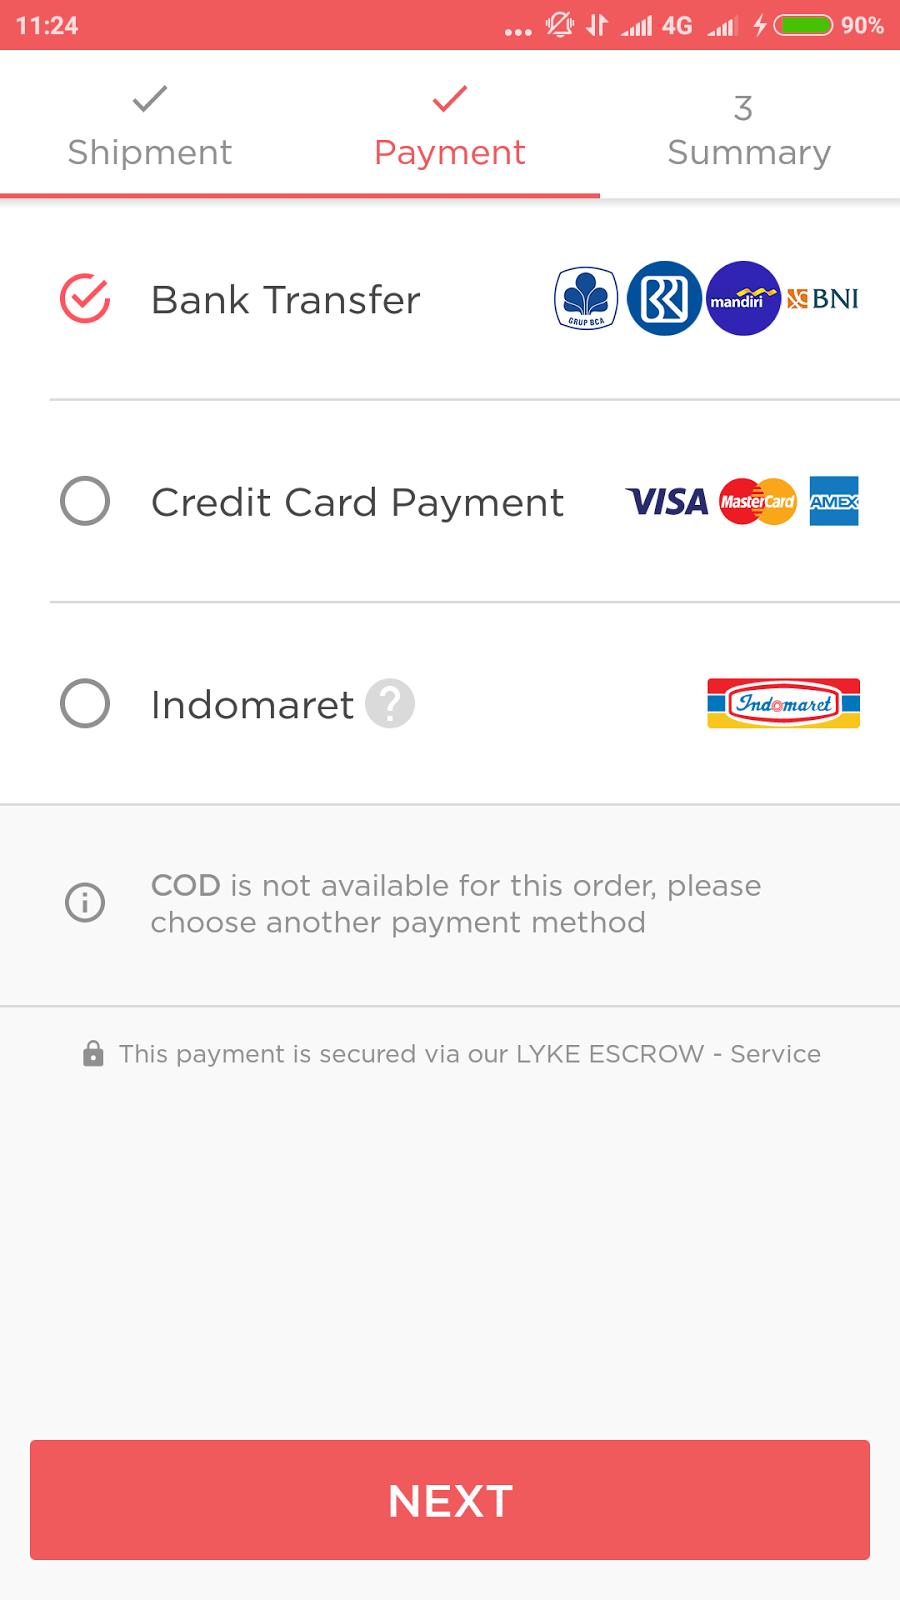 Shopping Online Pakai Go Points Gojek Semesta Della Voucher Belanja Indomart